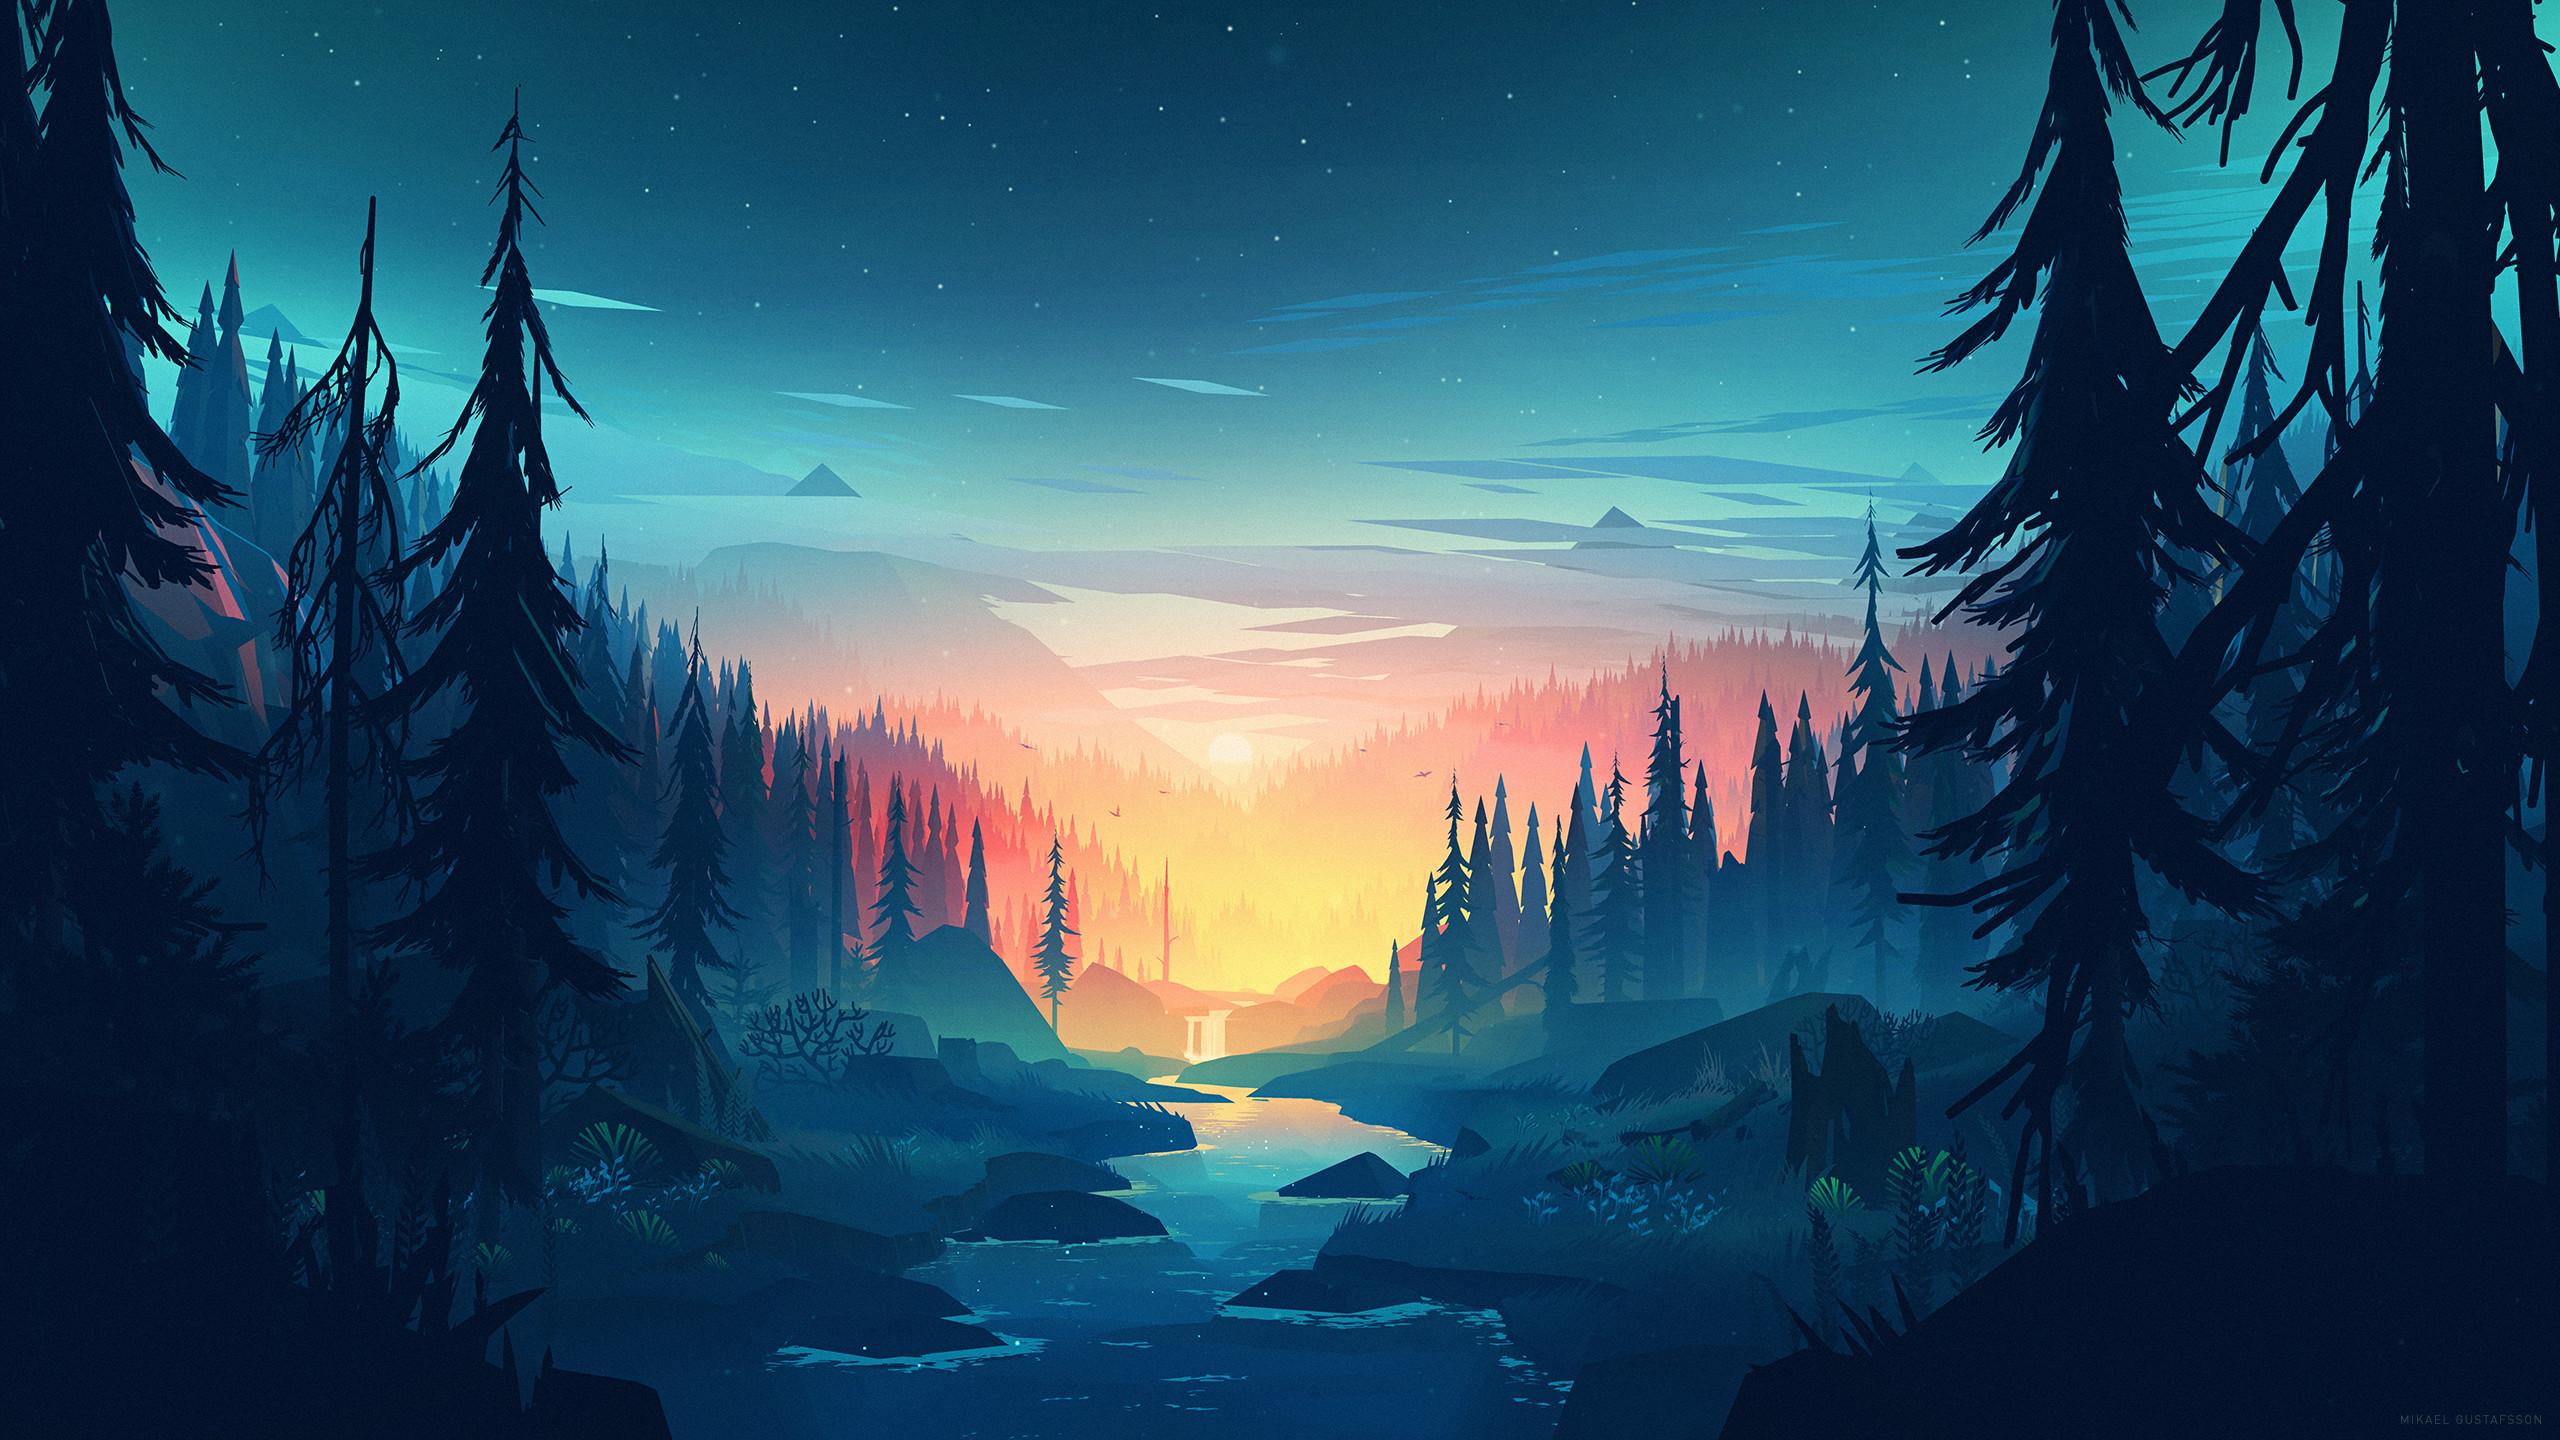 Res: 2560x1440, Artistic - Sunset Tree Artistic River Nature Landscape Forest Wallpaper